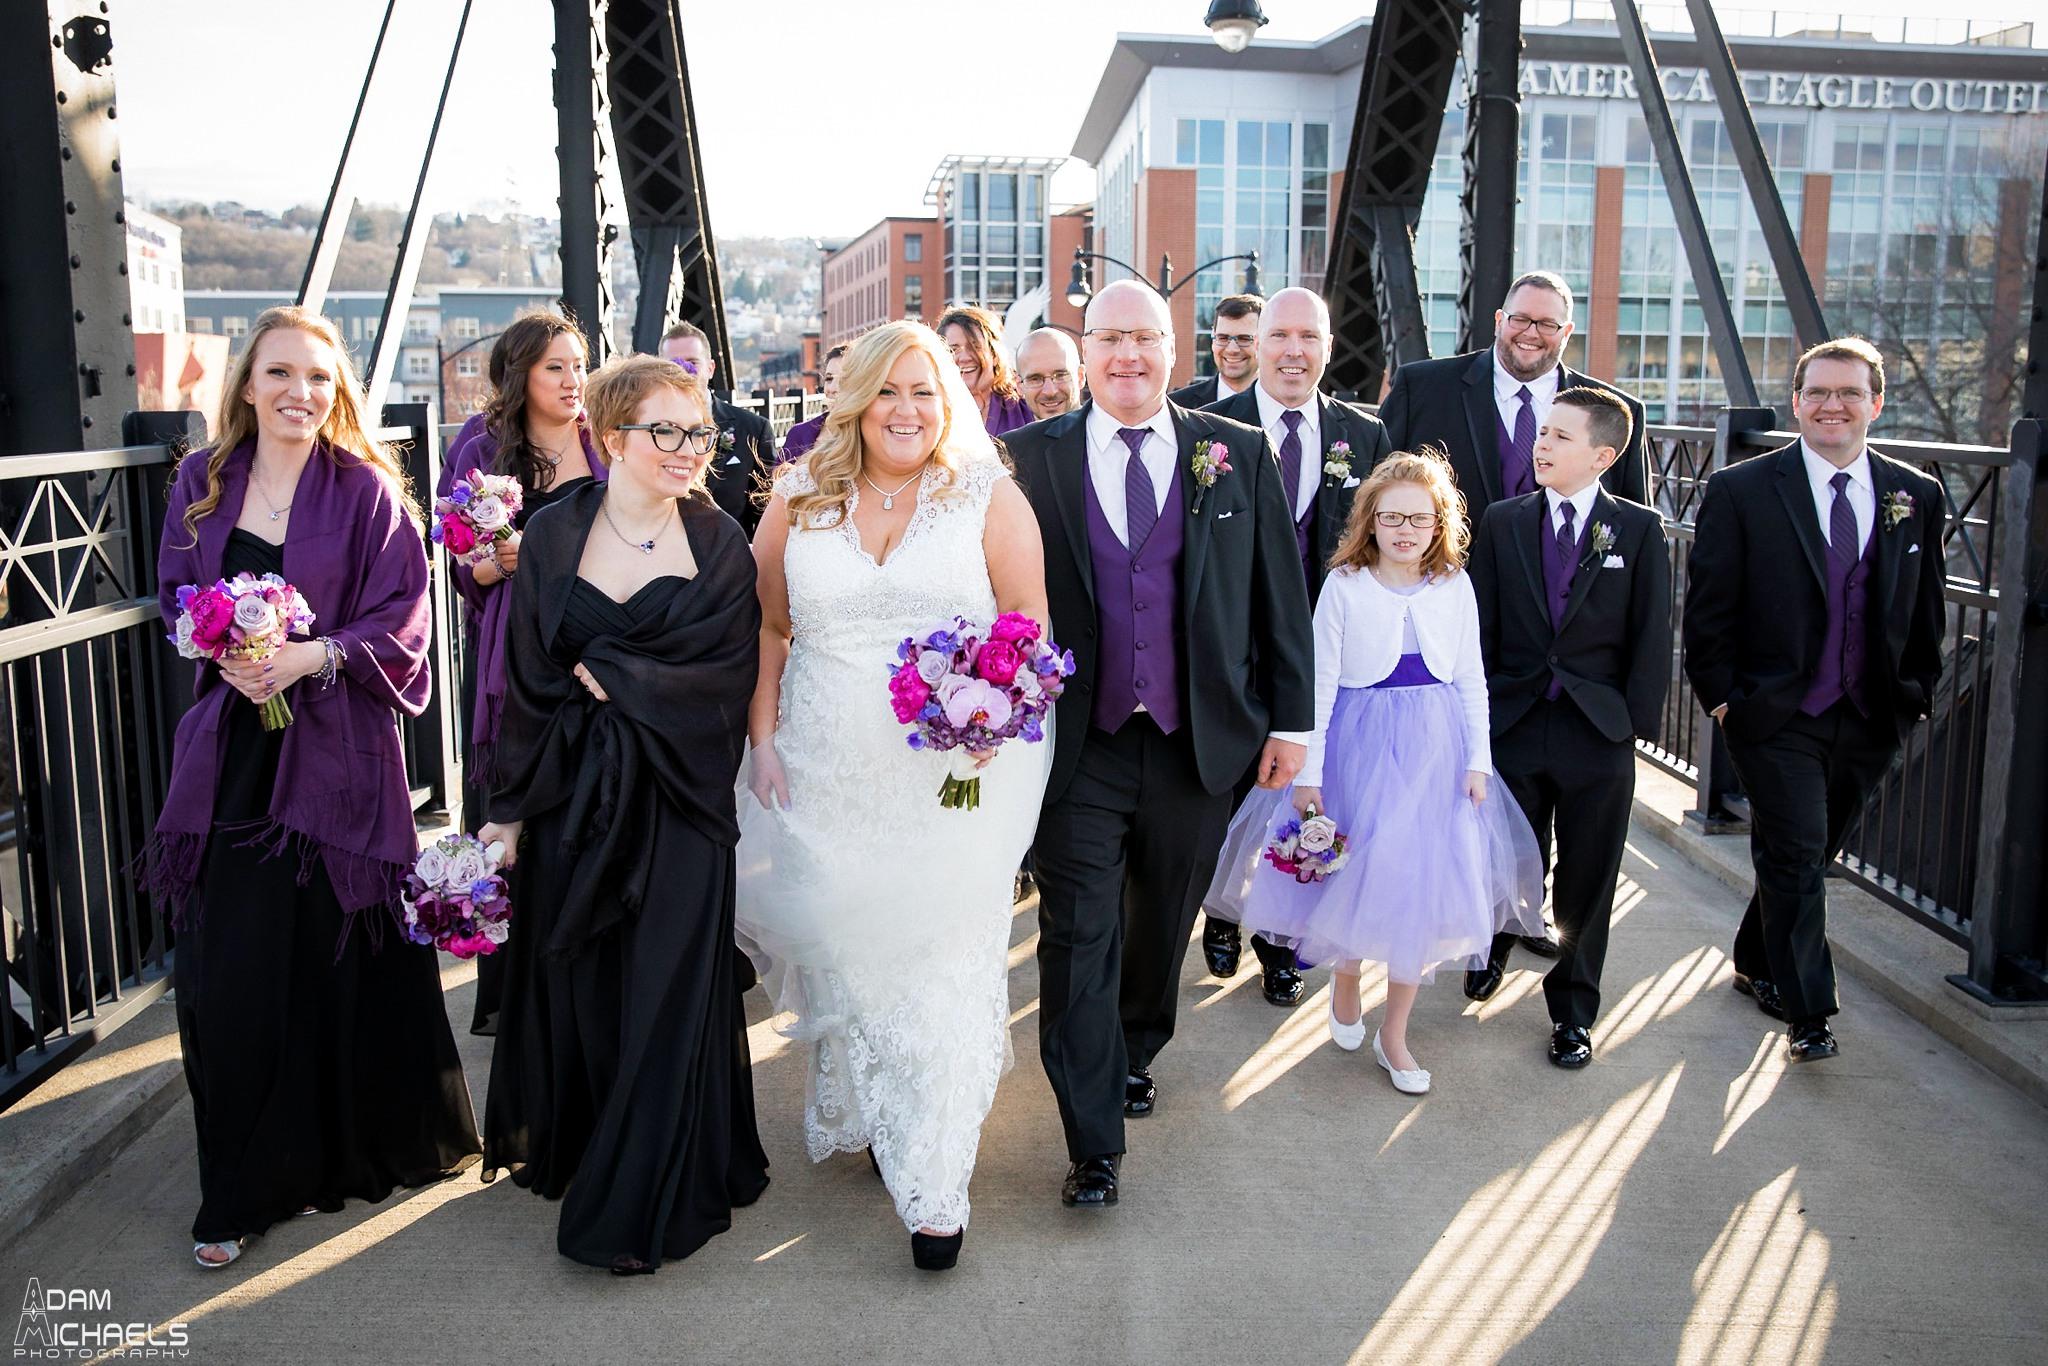 Hot Metal Bridge Circuit Center Wedding Pictures_2157.jpg